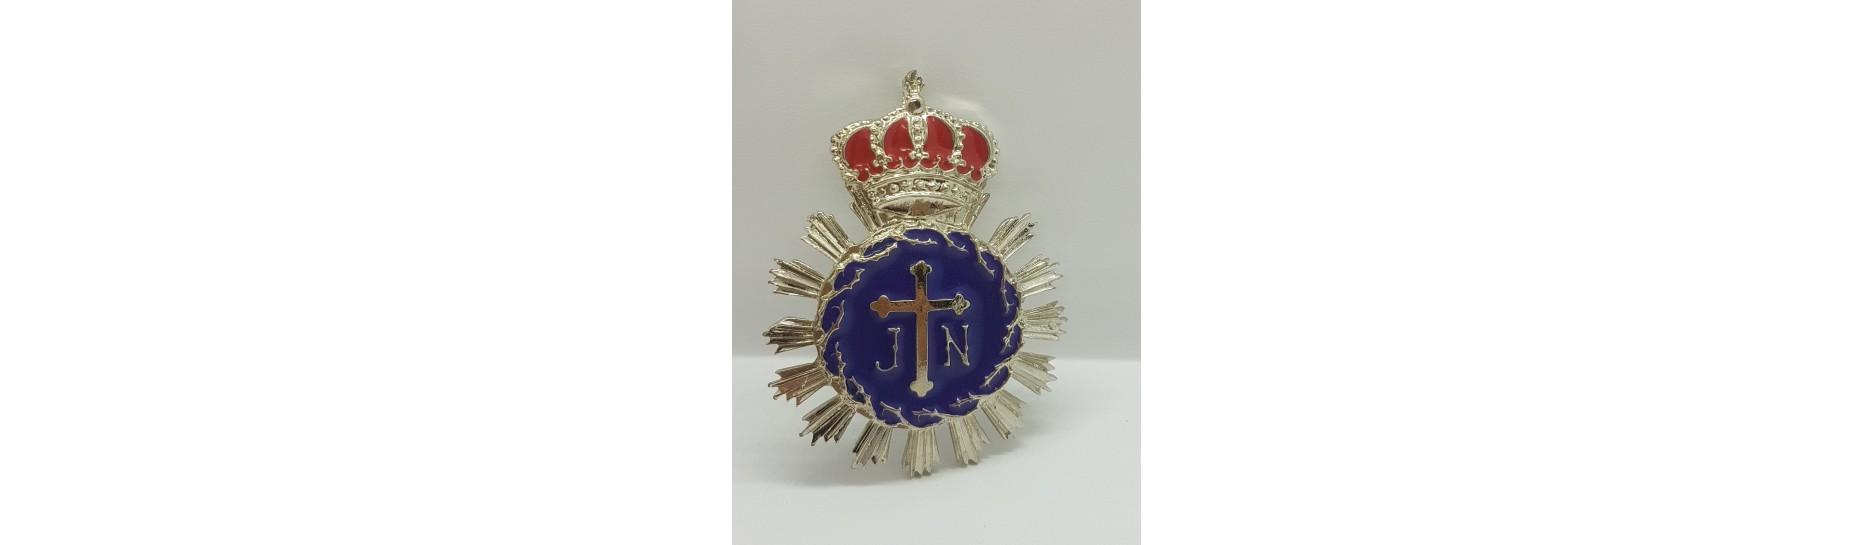 ▷ Medallas Cofradias Semana Santa  - 【 Merceria Online Sonia®】